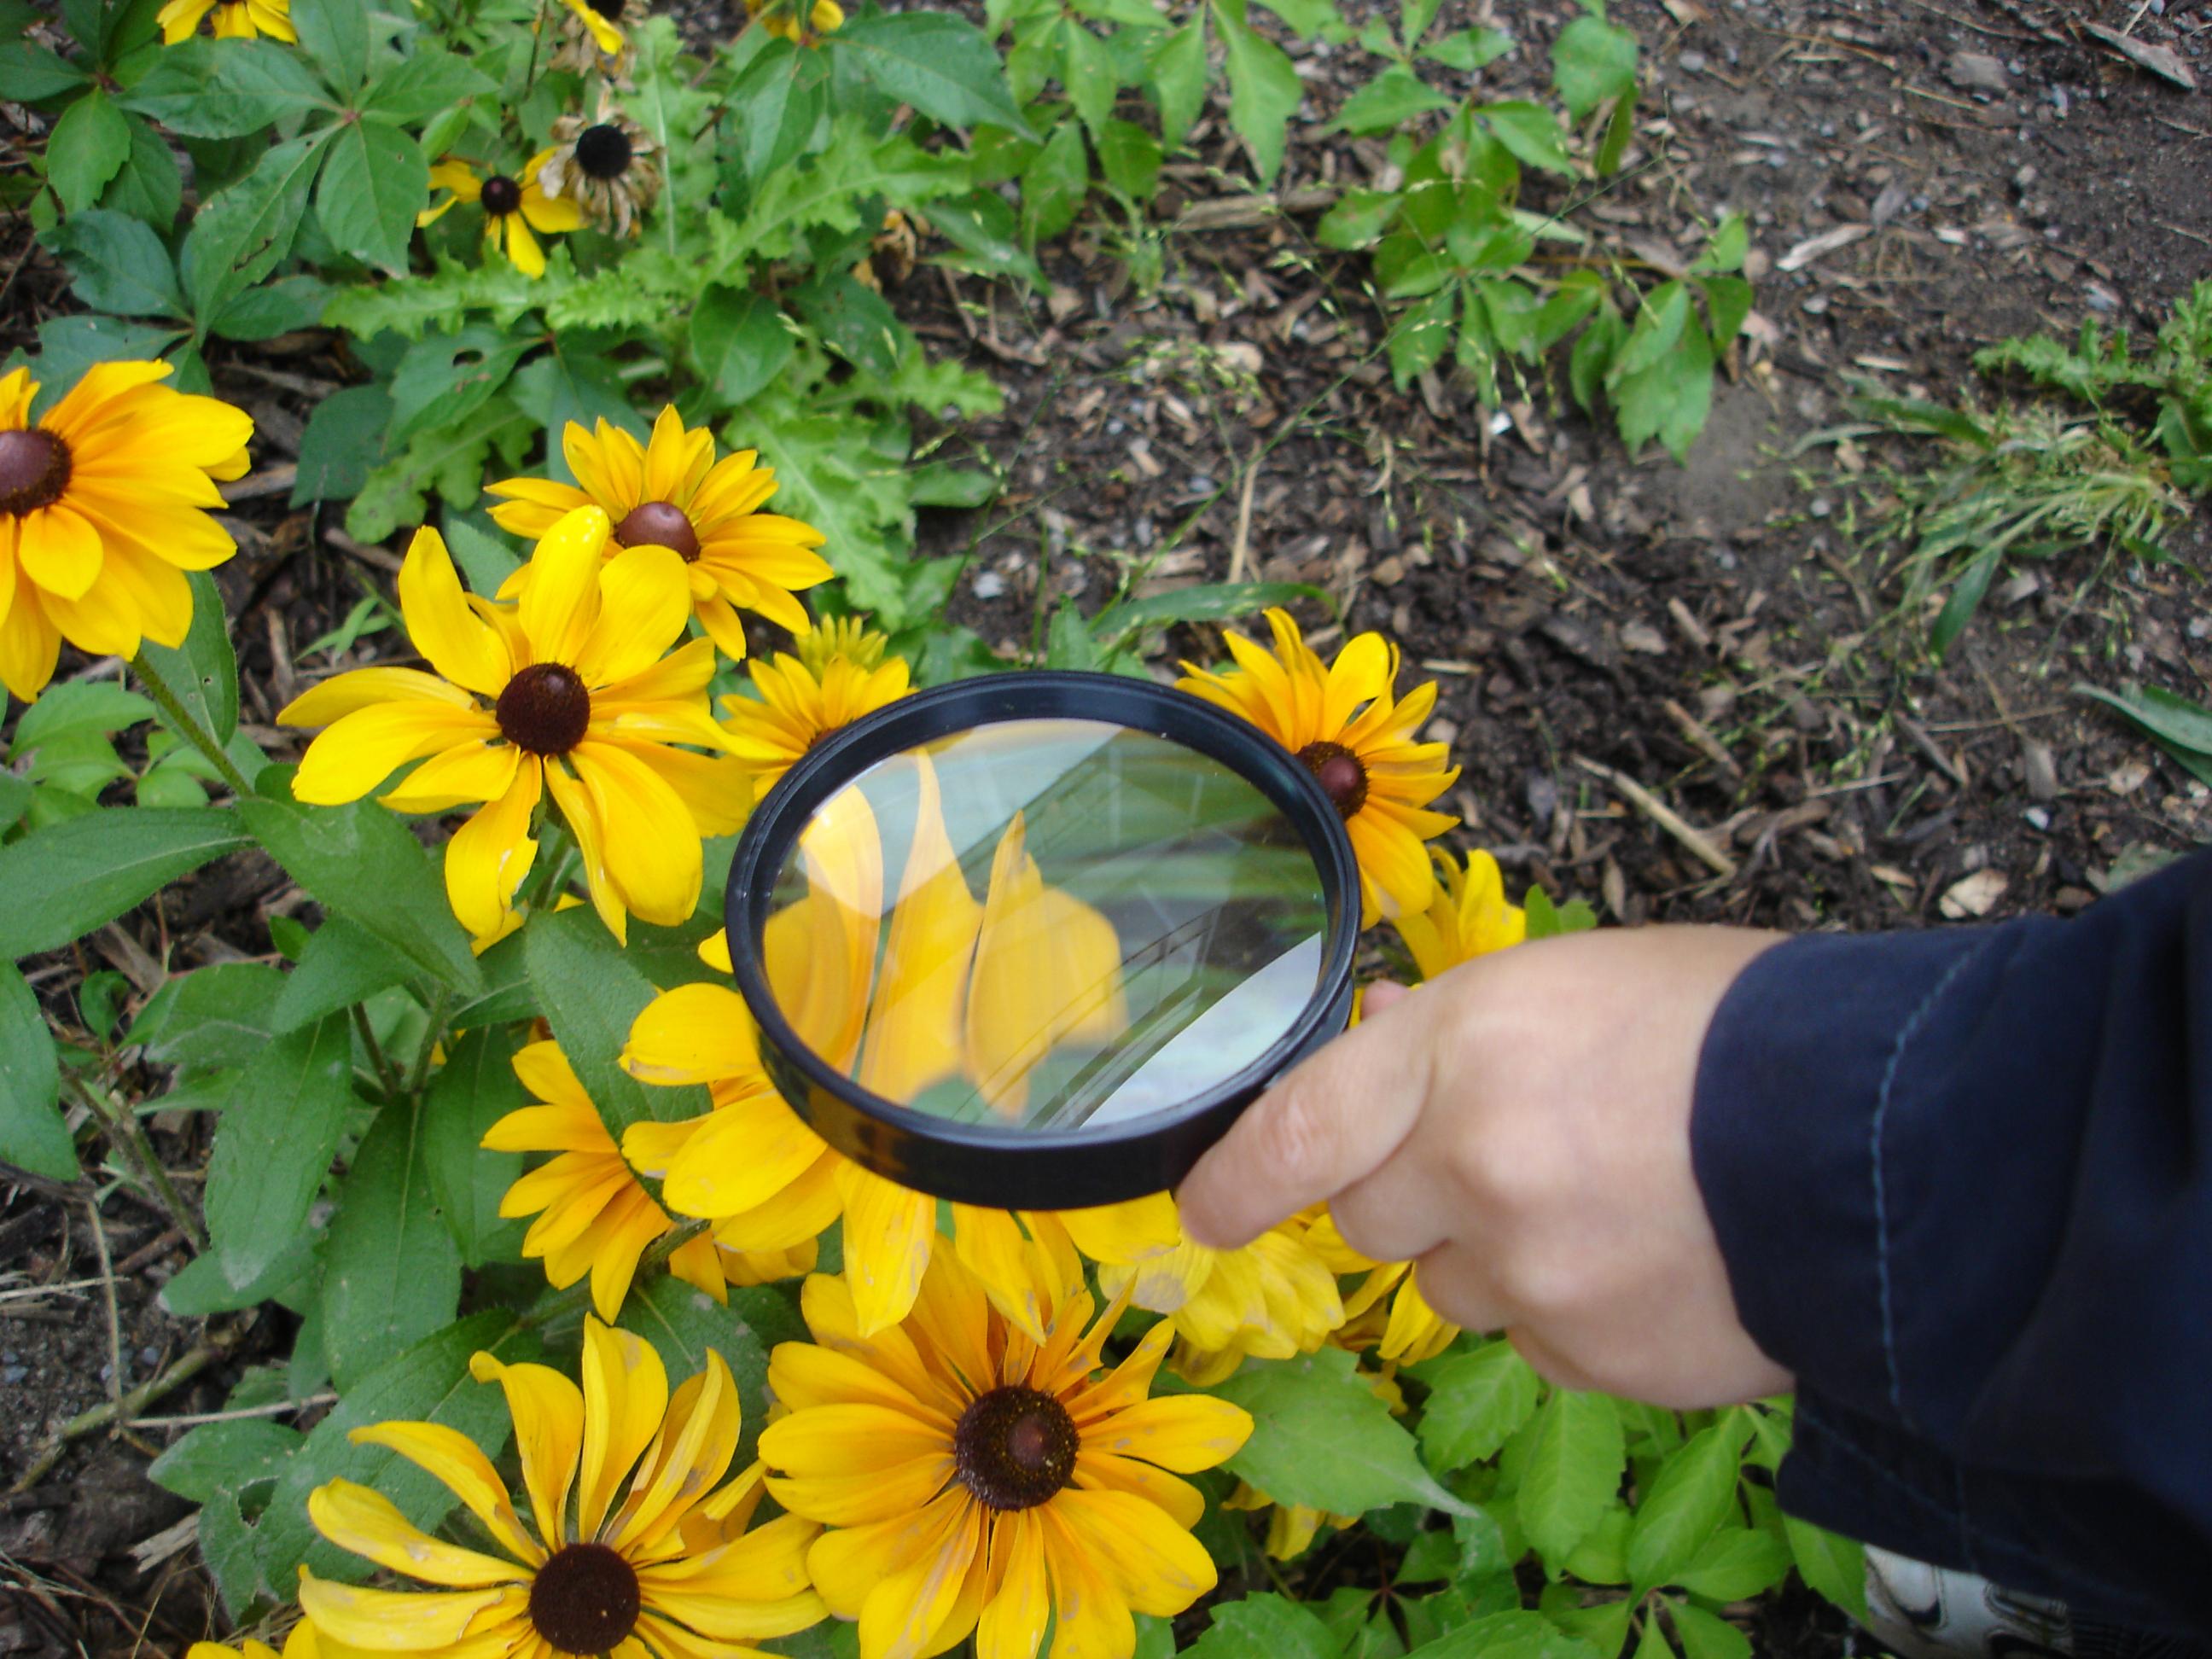 Outdoor Classroom Ideas Kindergarten ~ Learning in the outdoor classroom curious kindergarten